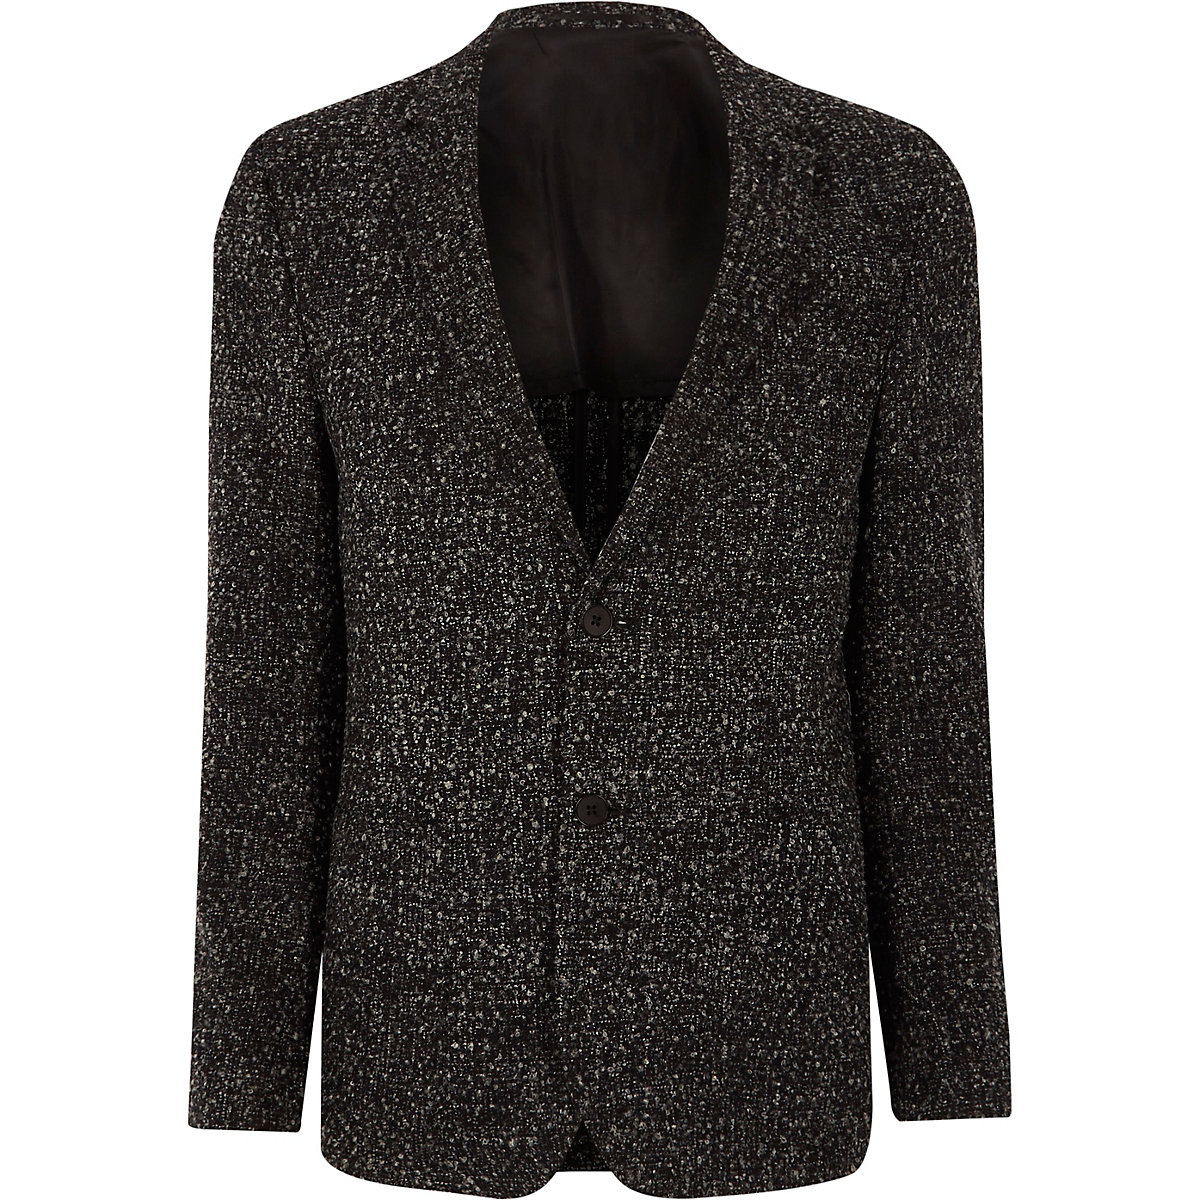 Navy boucle skinny fit blazer